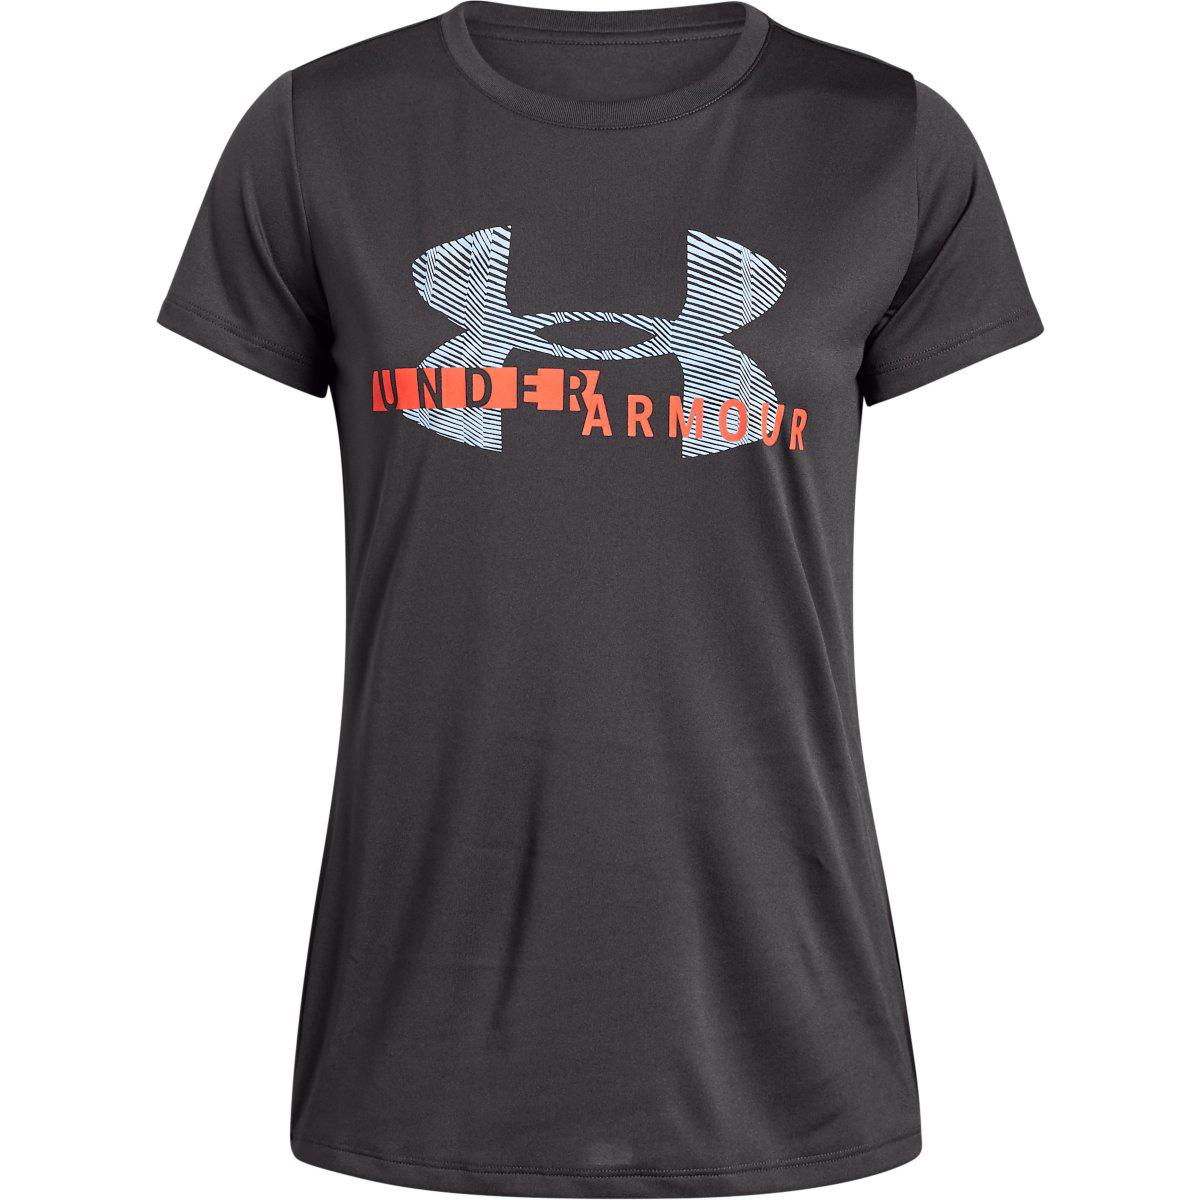 Under Armour Women's Ua Tech Graphic Short-Sleeve Tee - Black, M